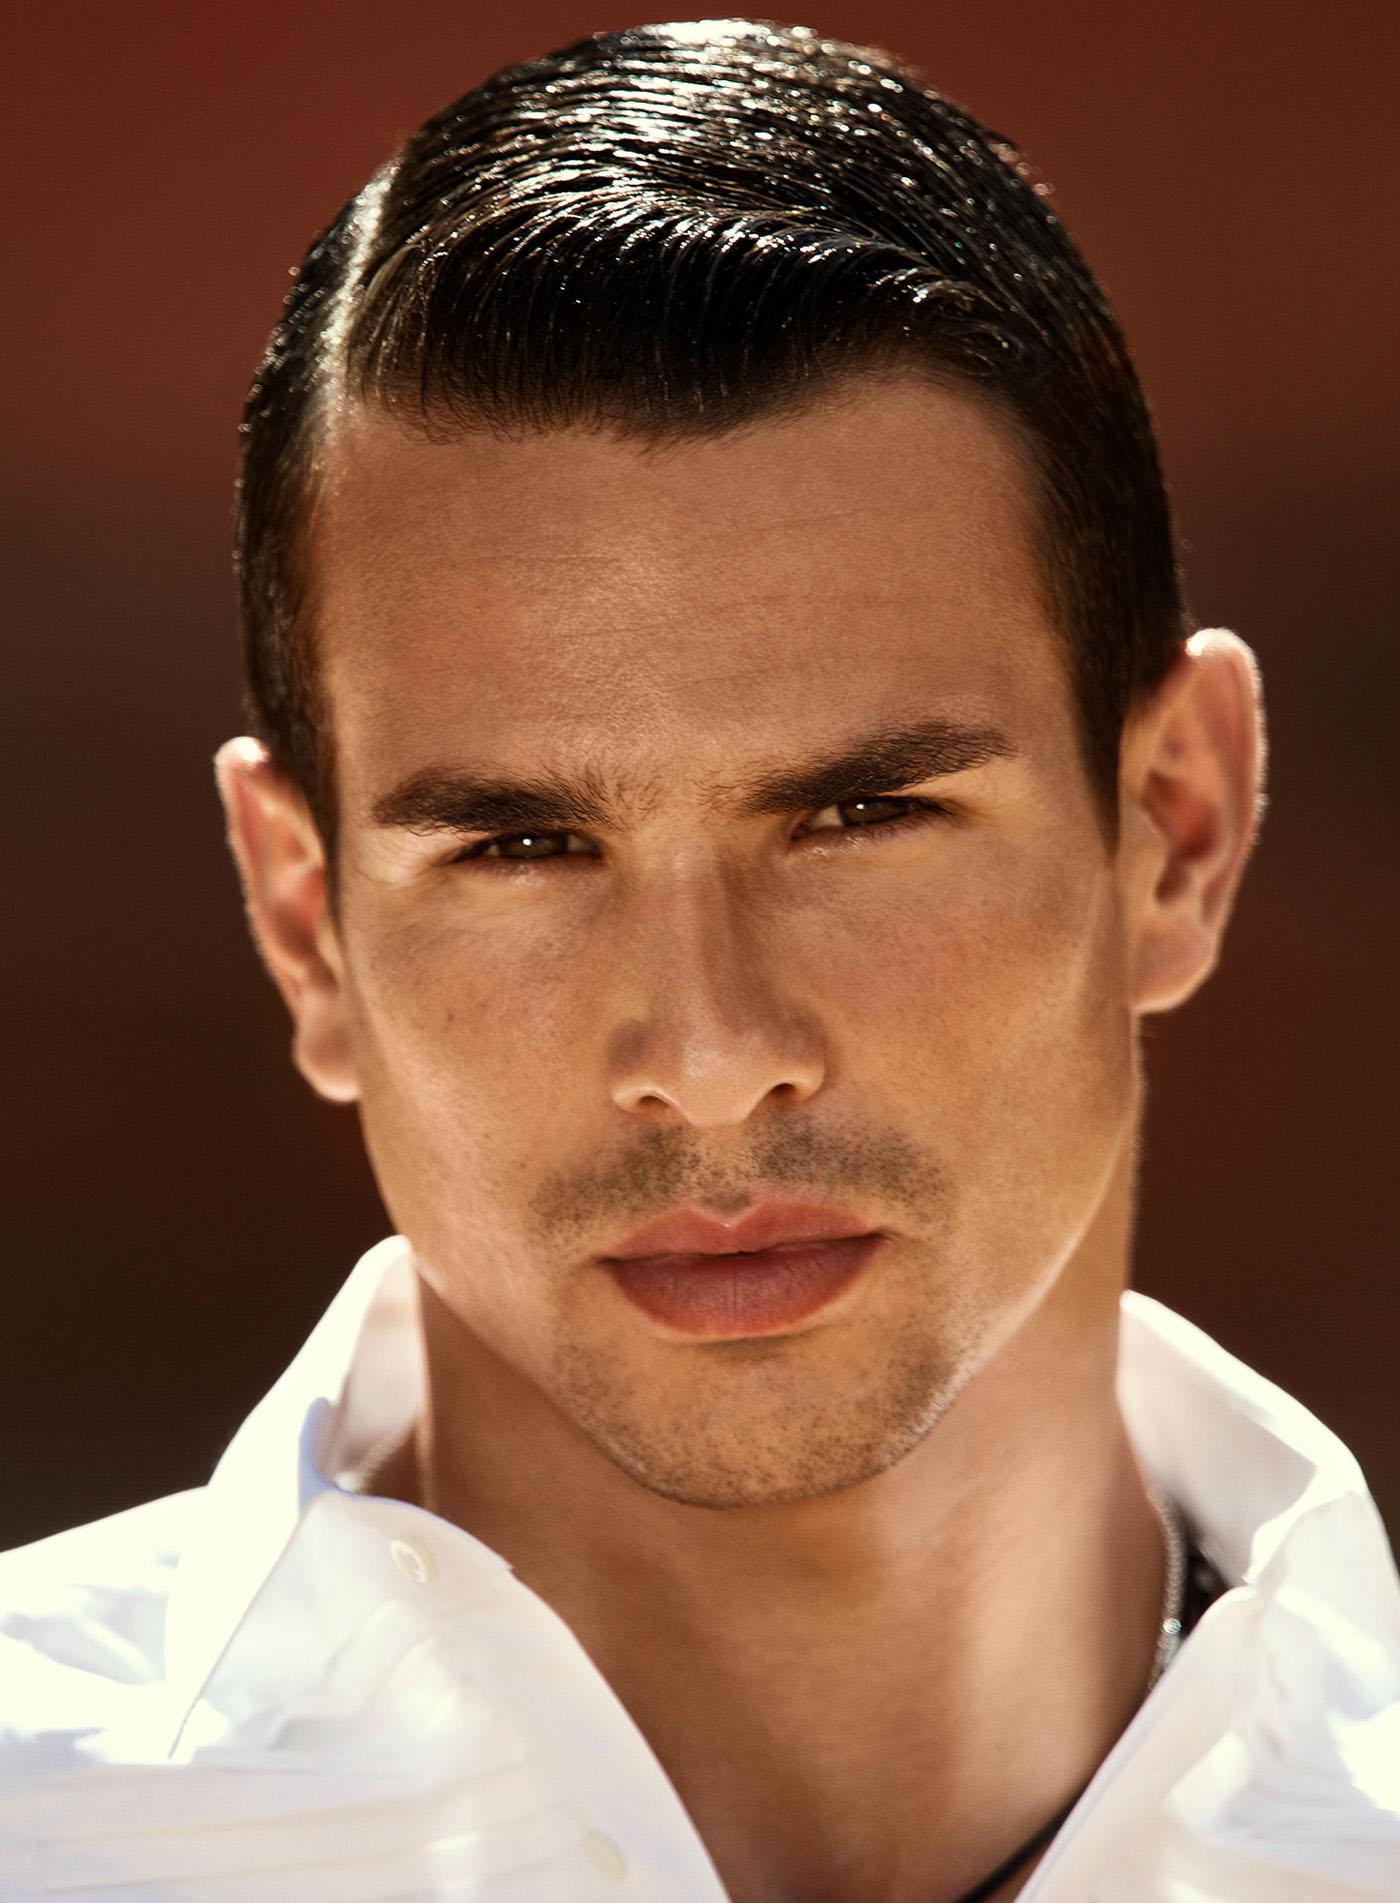 фото испанских мужчин особенности внешности народу полно